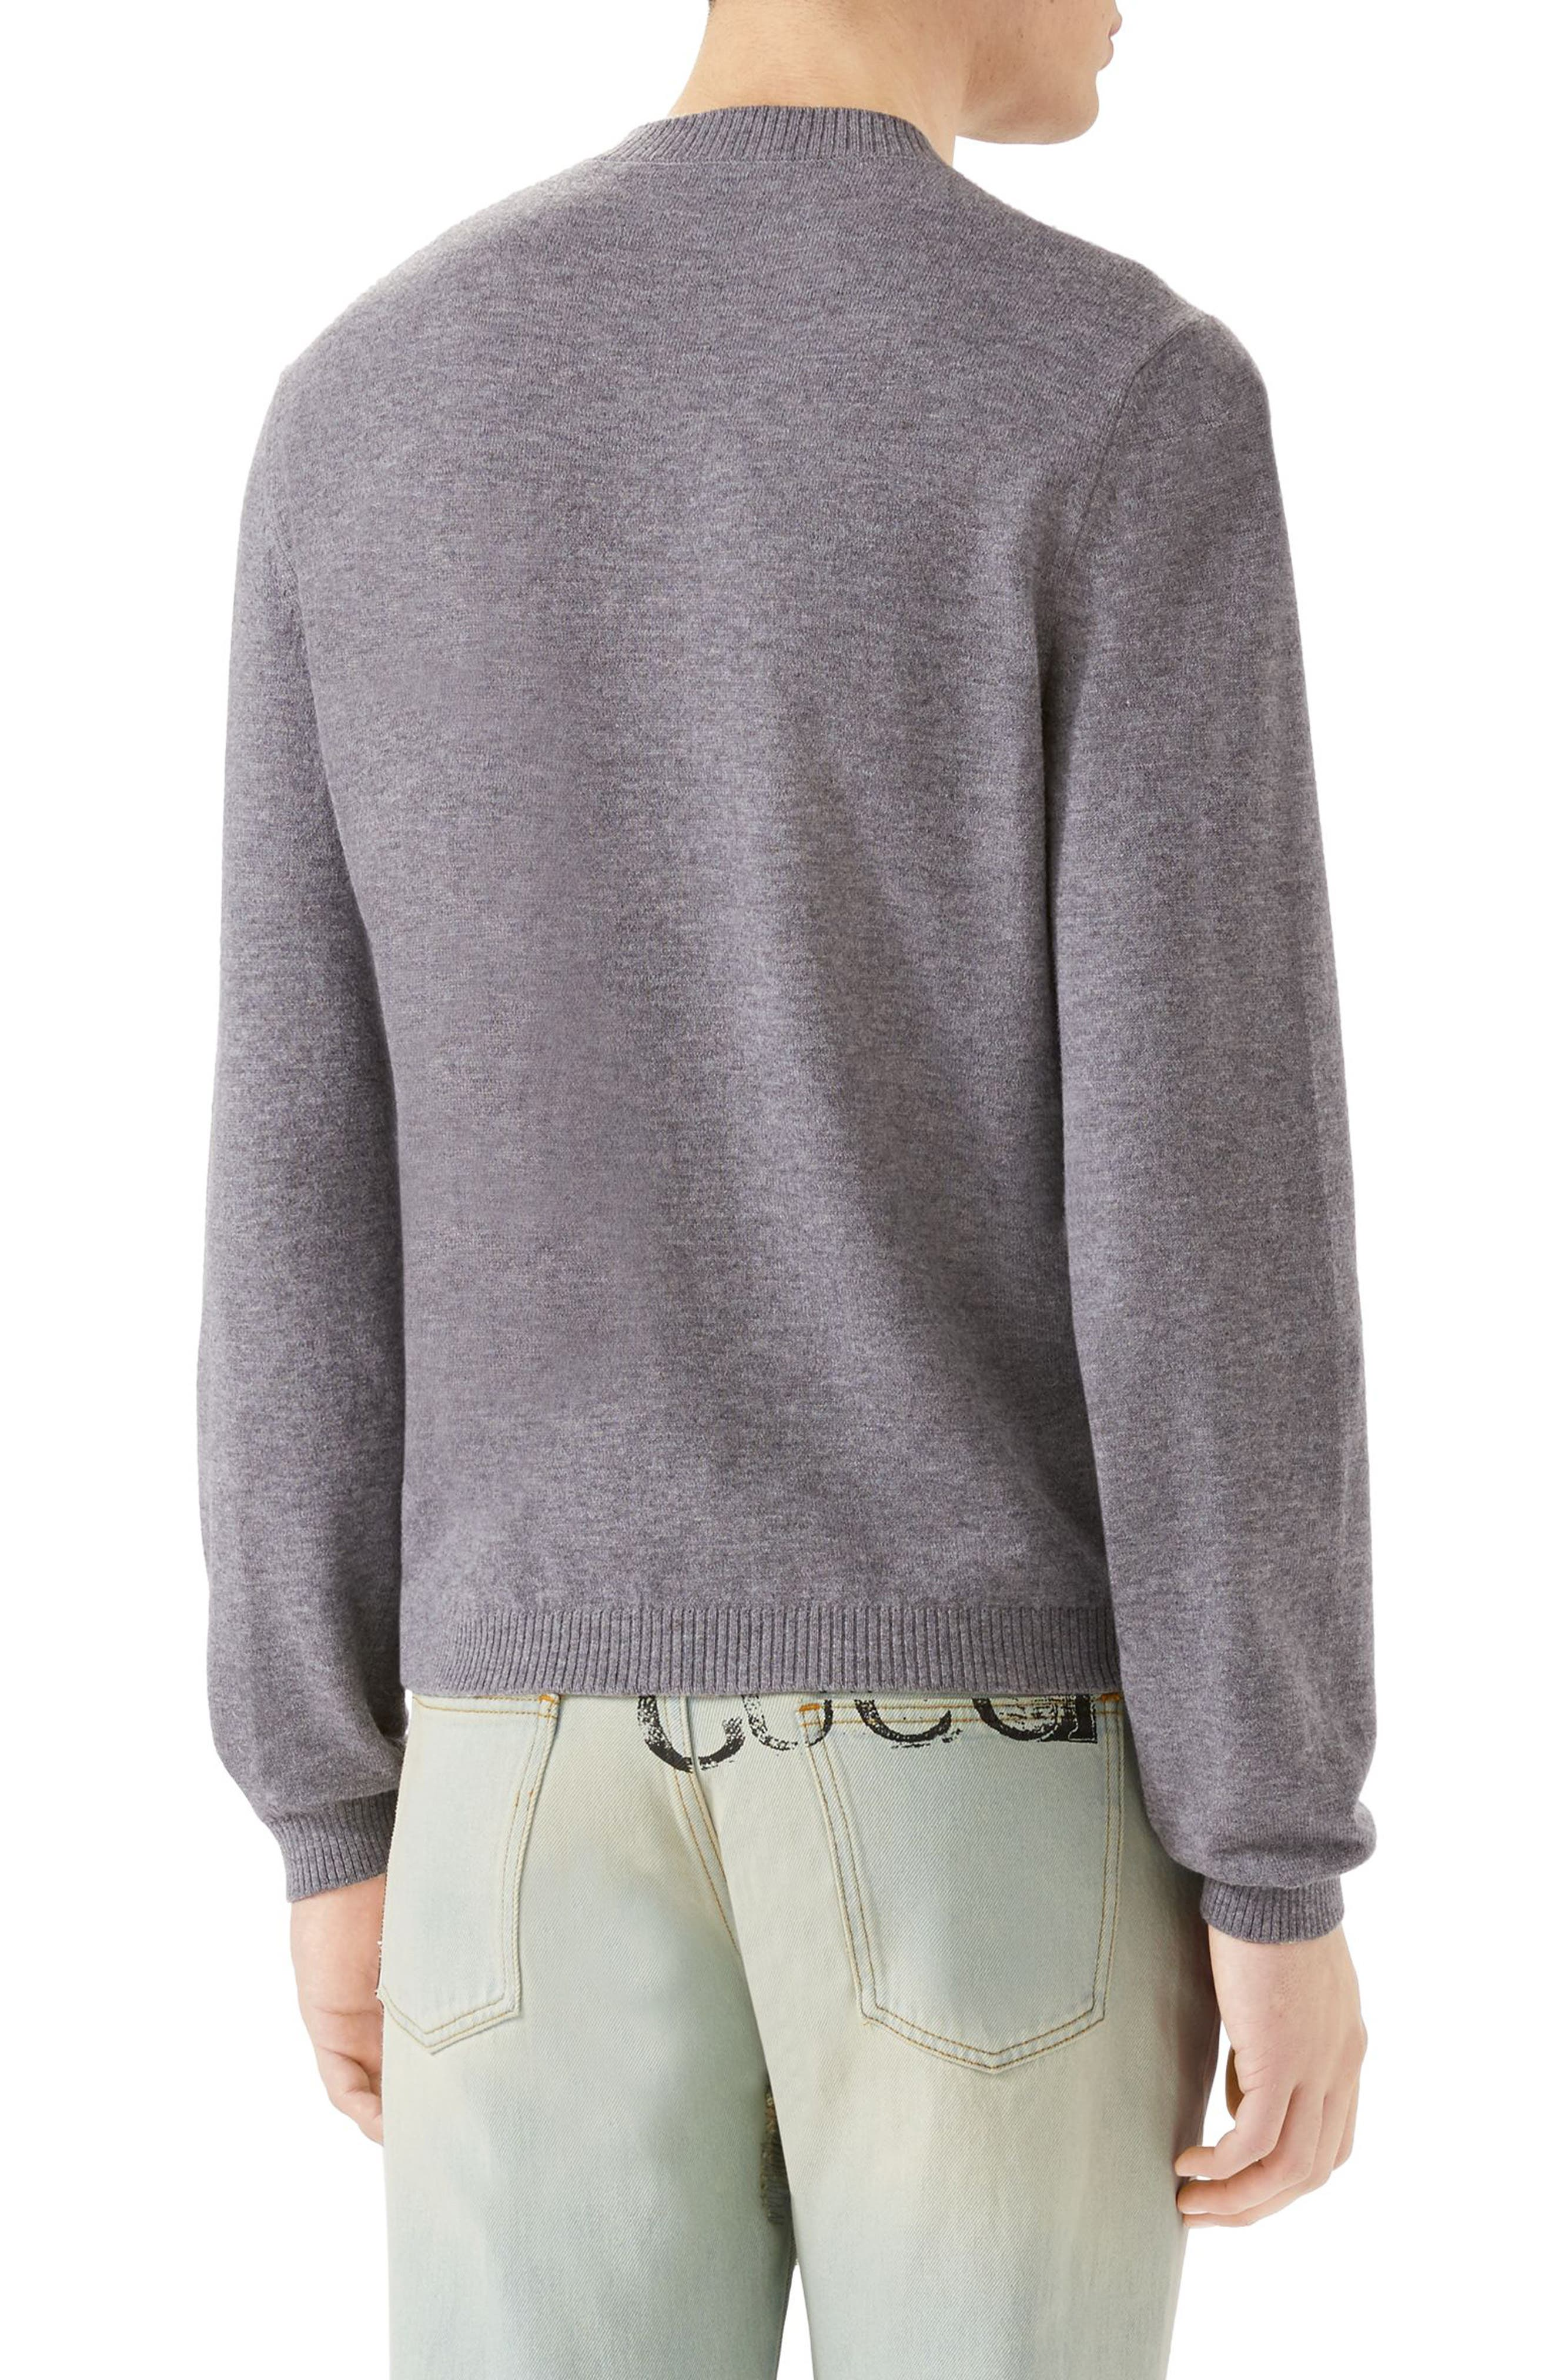 Embroidered Wool Crewneck Sweater,                             Alternate thumbnail 2, color,                             MEDIUM GREY